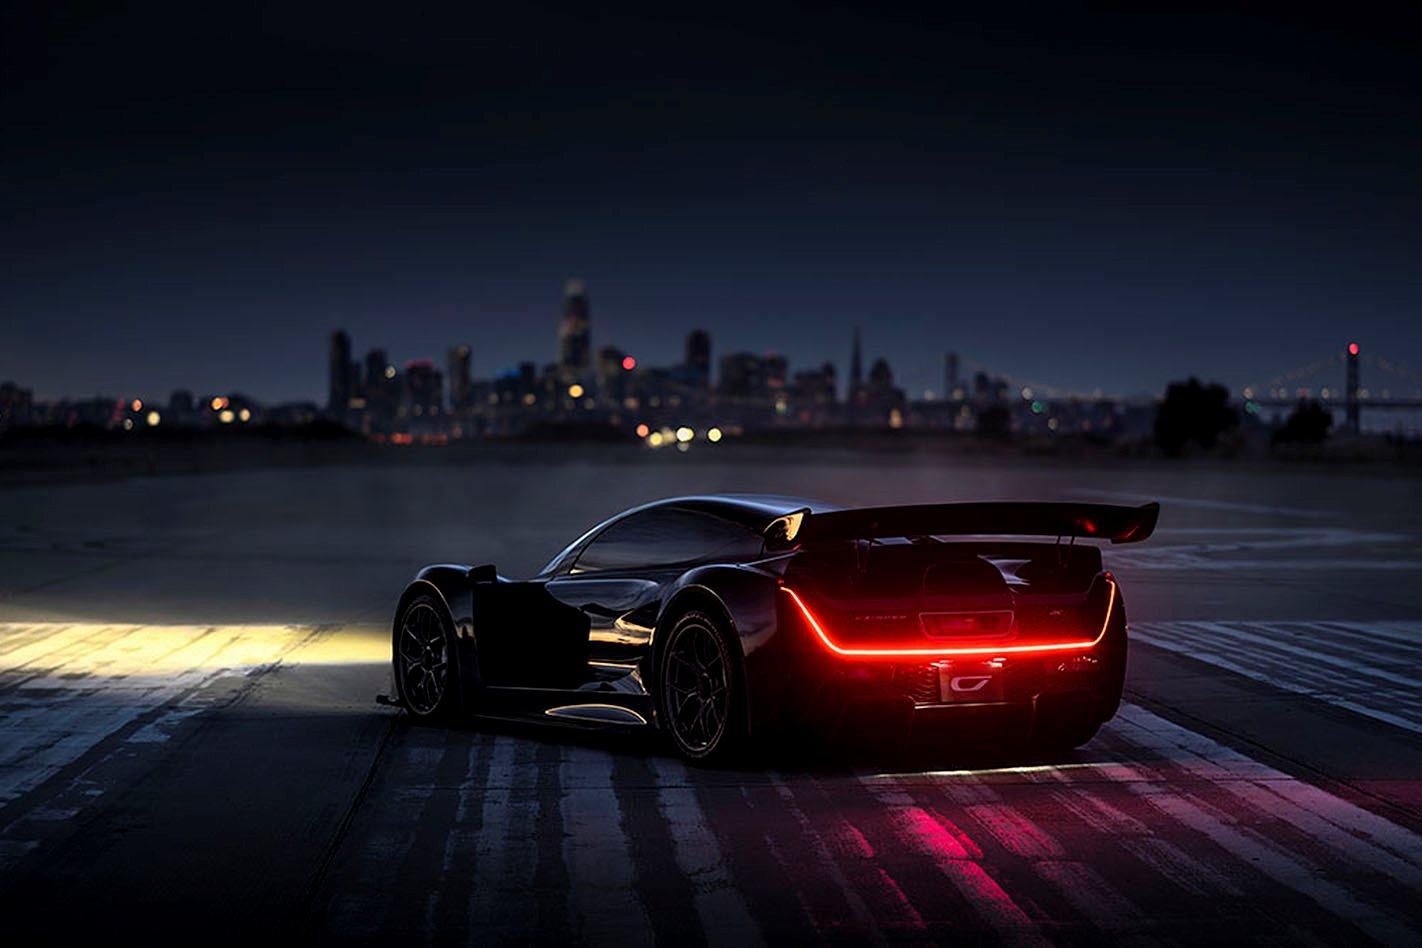 Geneva Motor Show: 2020 preview